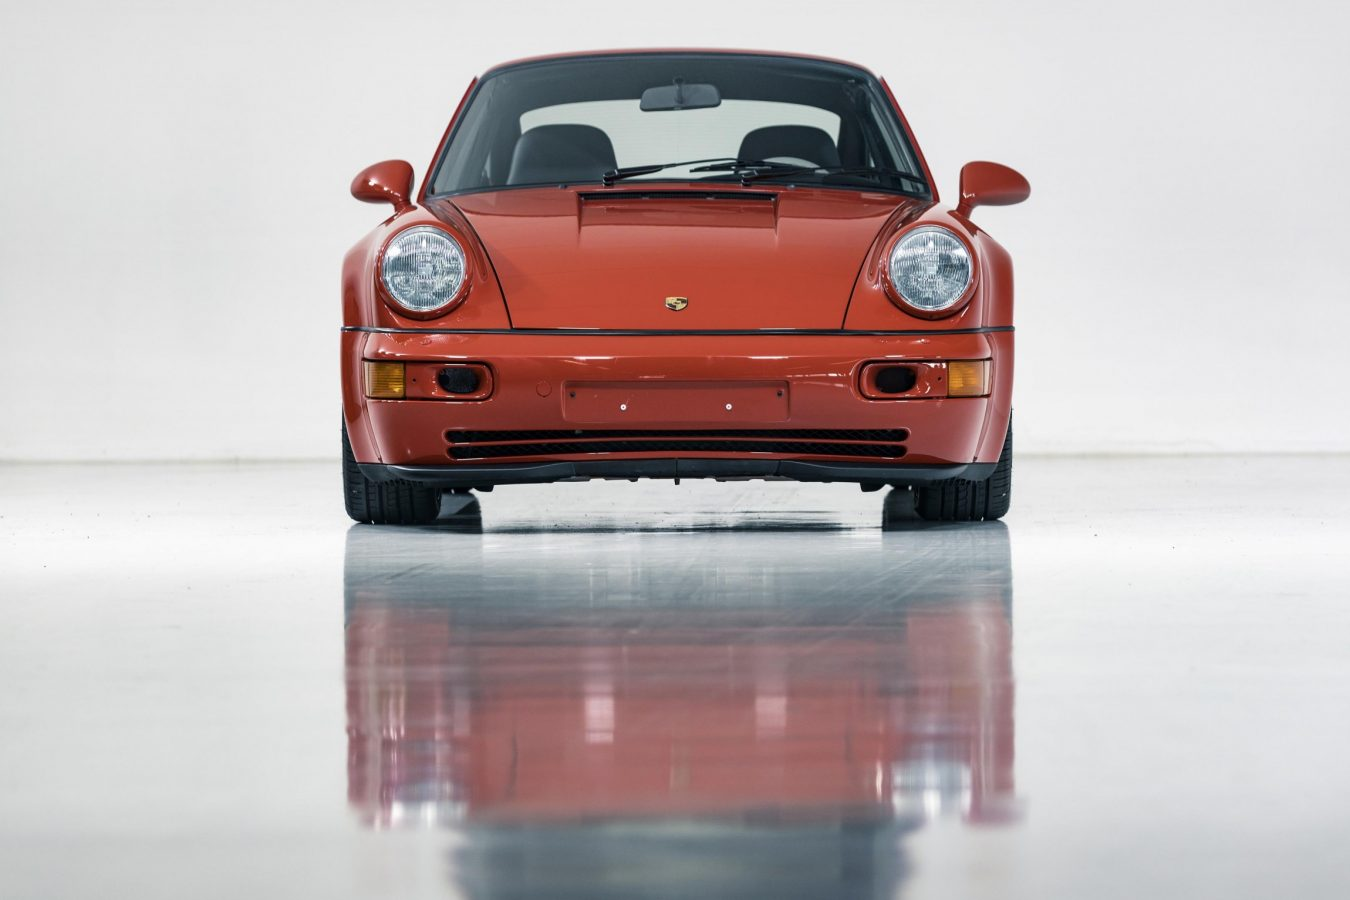 Porsche 911 Turbo S 22